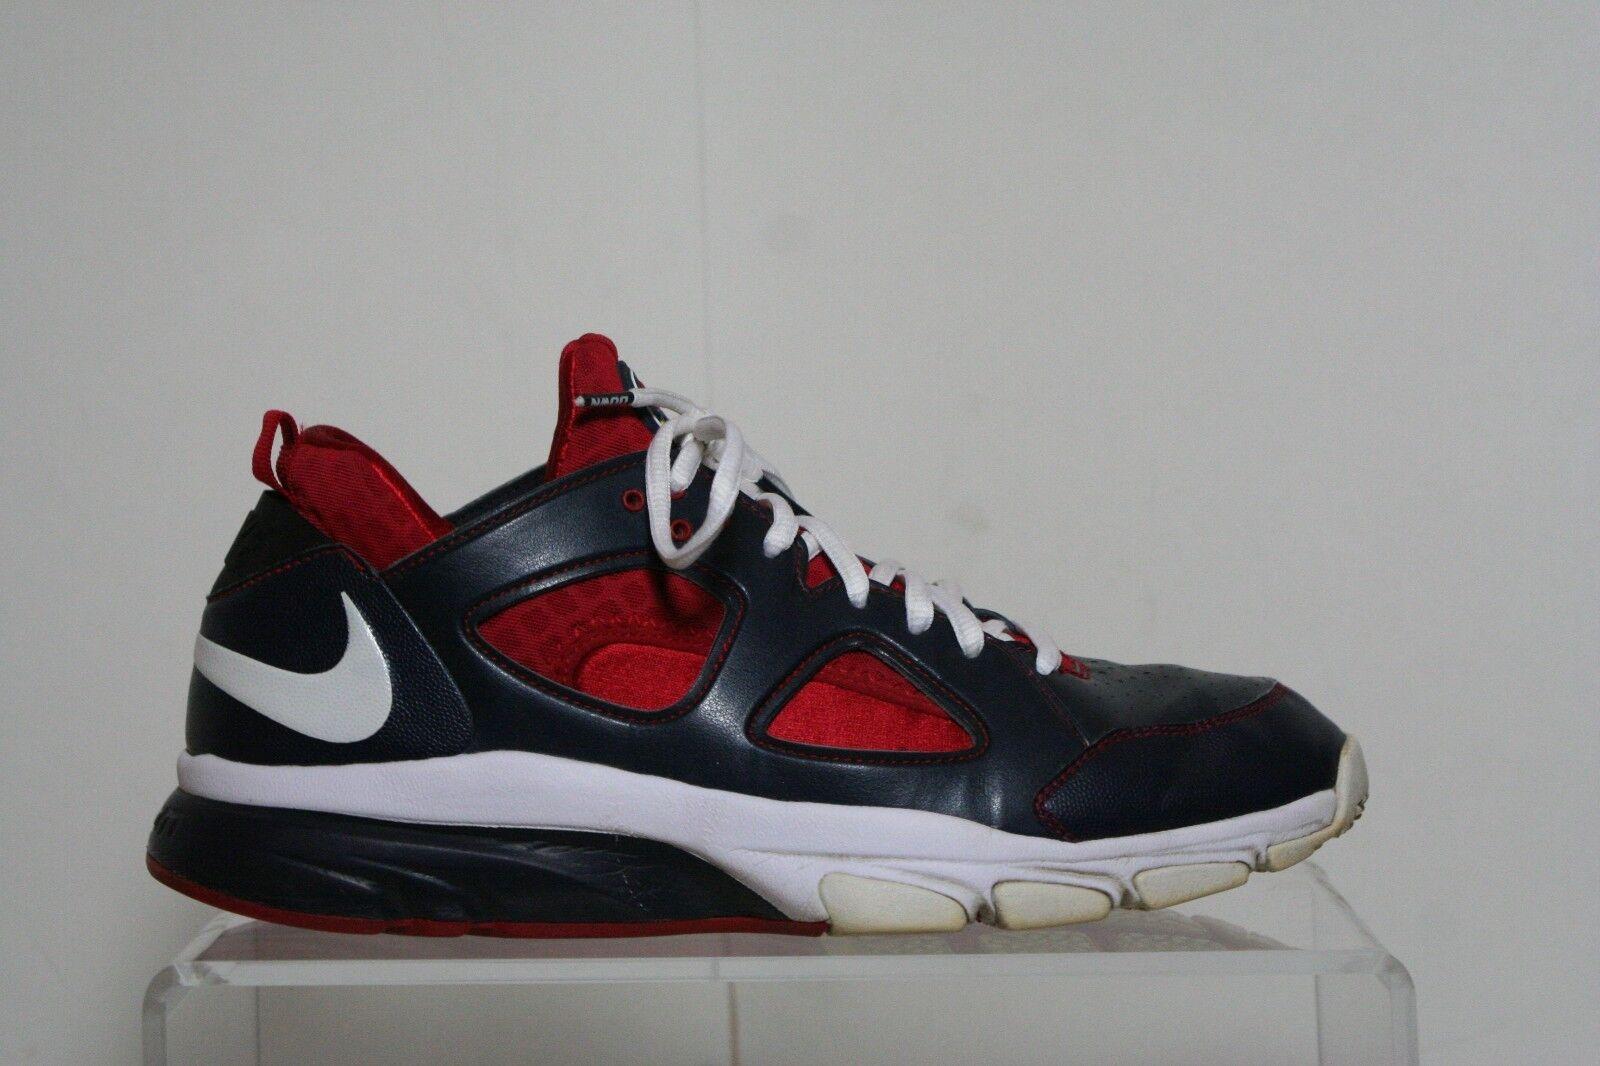 Nike zoom huarache tr basso playstation 2010 multi - usa rosso - bianco - blu gli uomini 11 sony